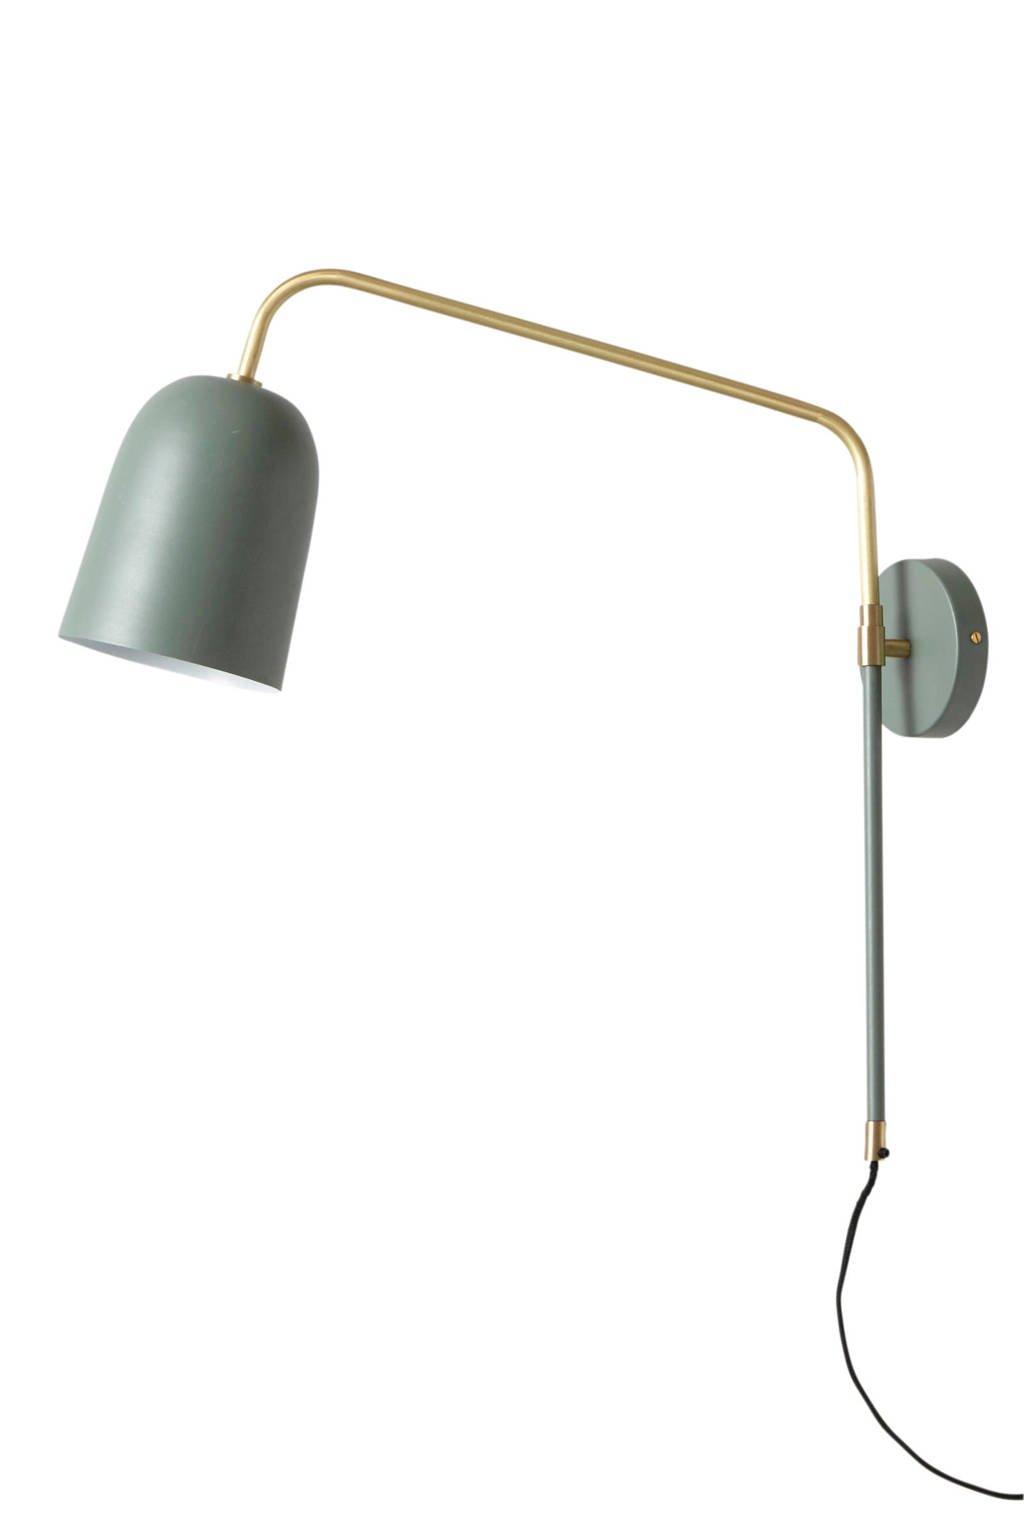 whkmp's own wandlamp, Zeegroen